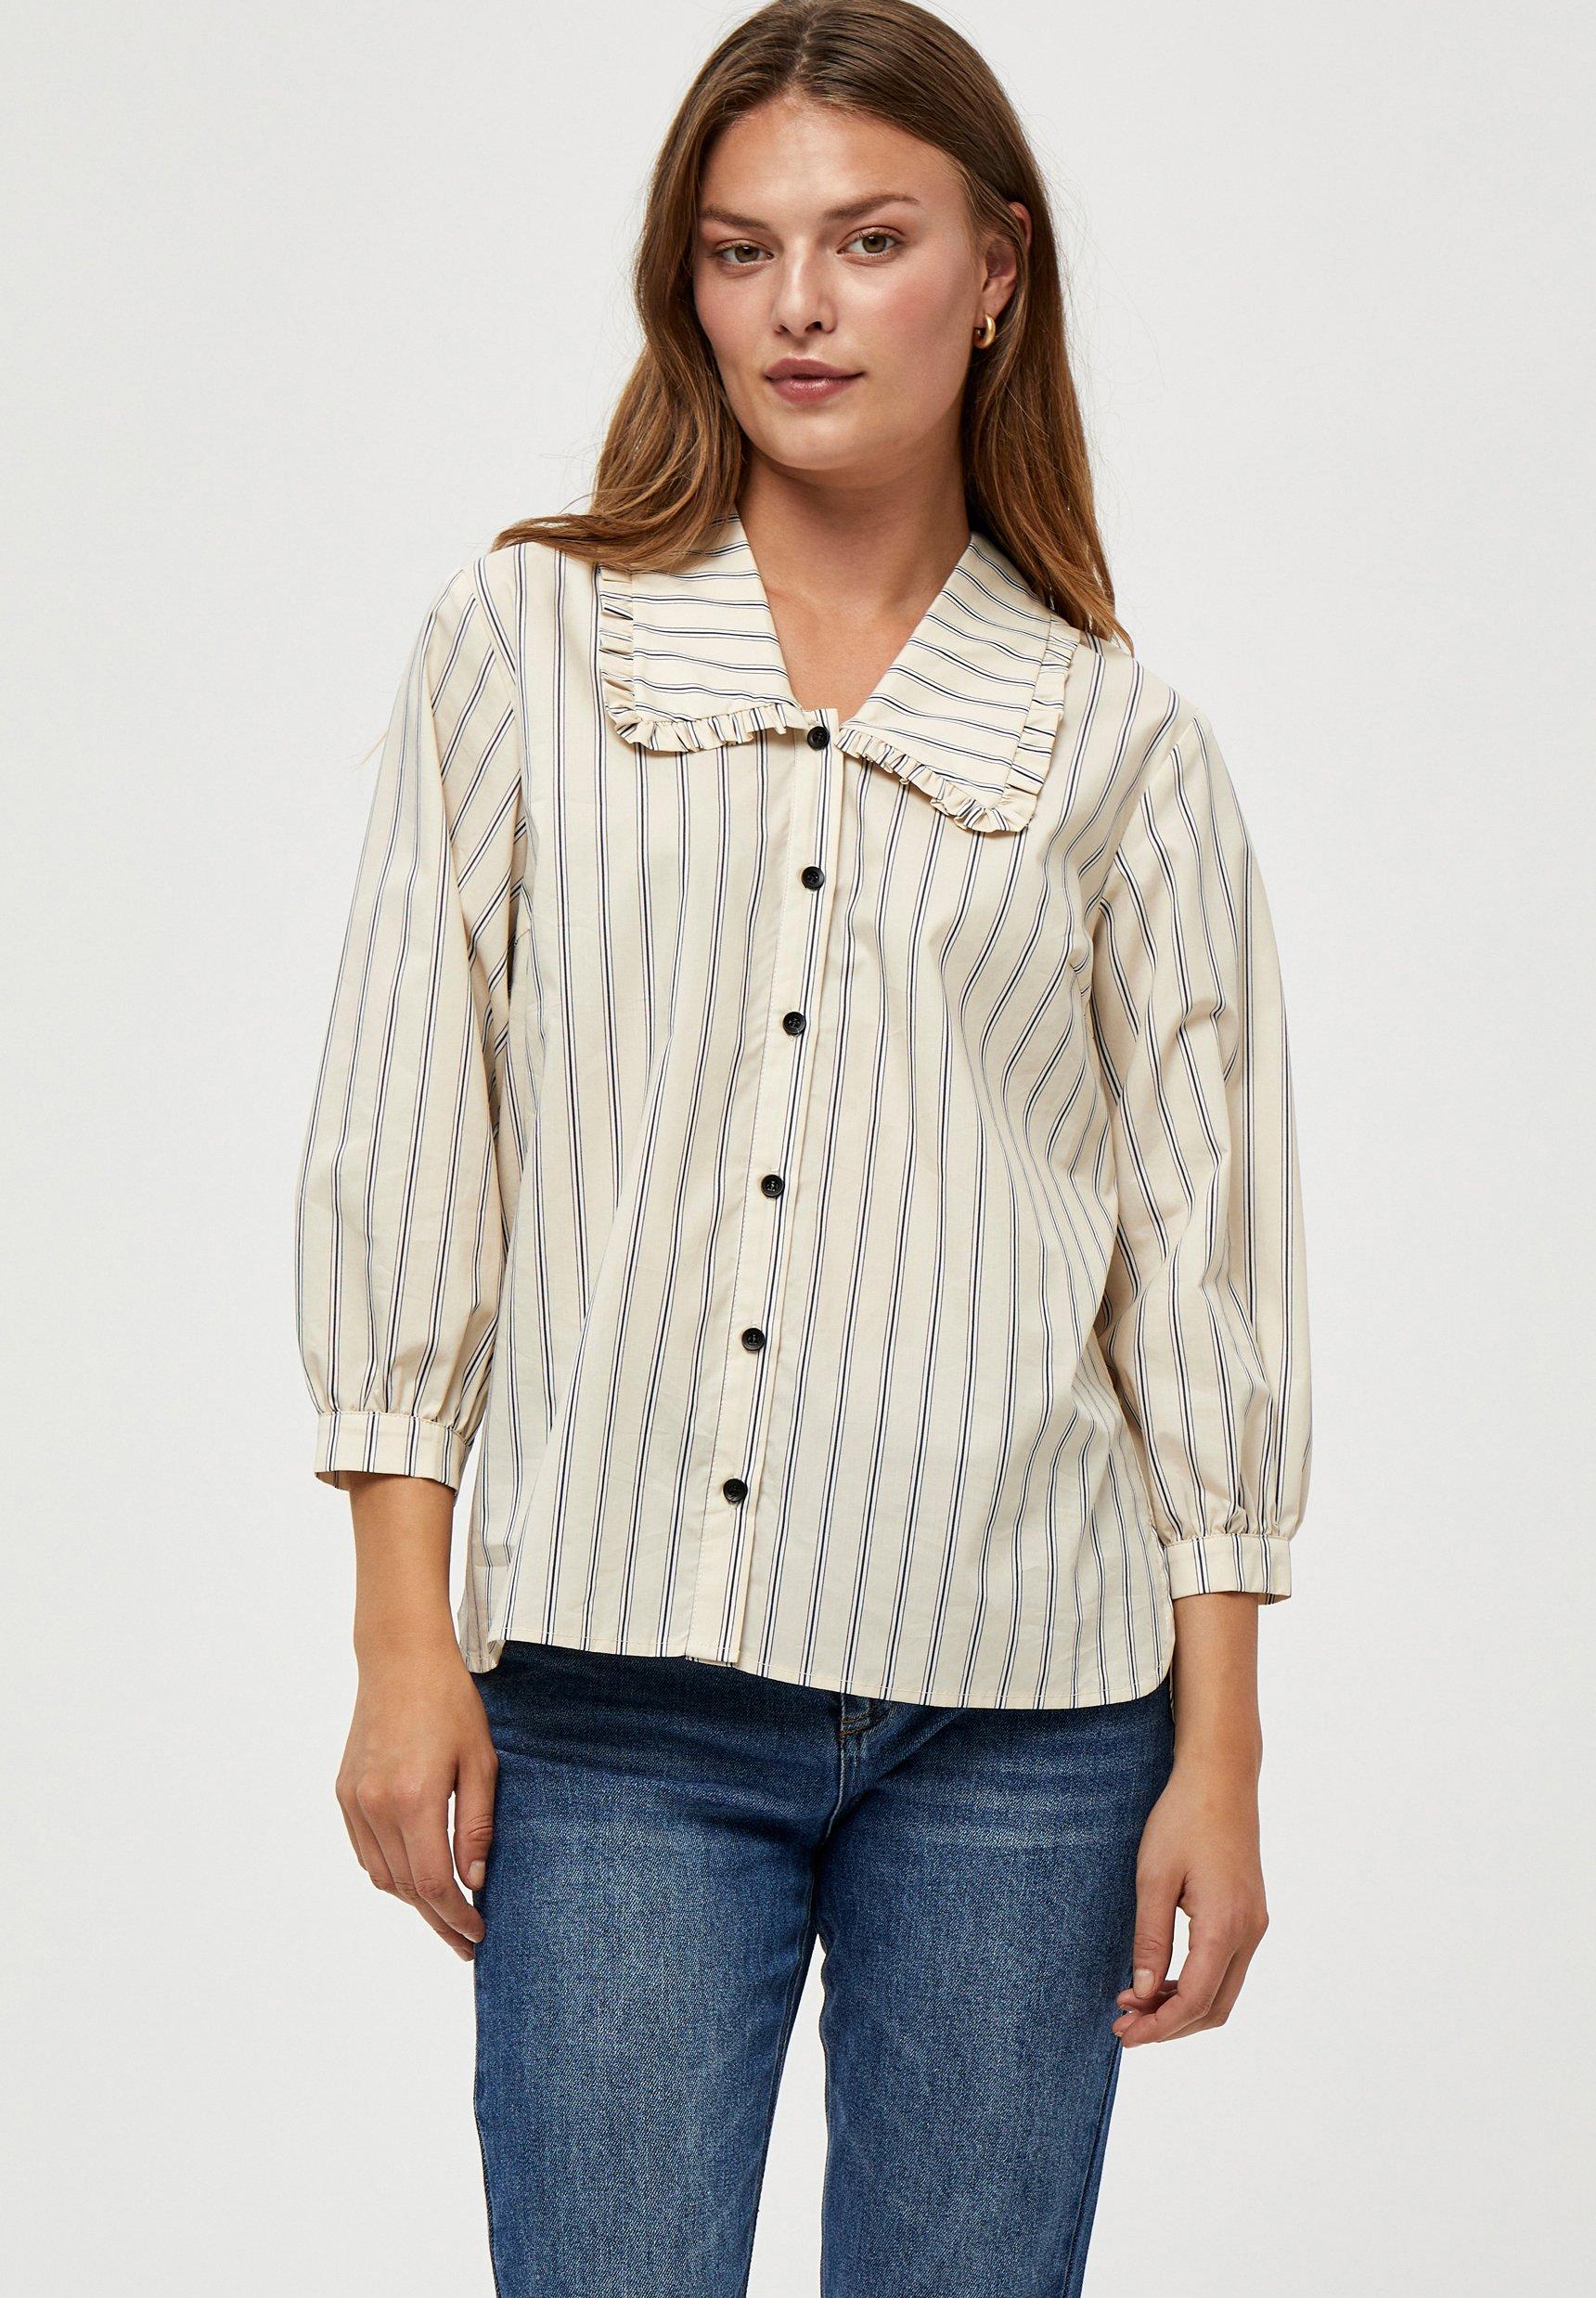 Donna JEDDY V NECK SHIRT - Camicia